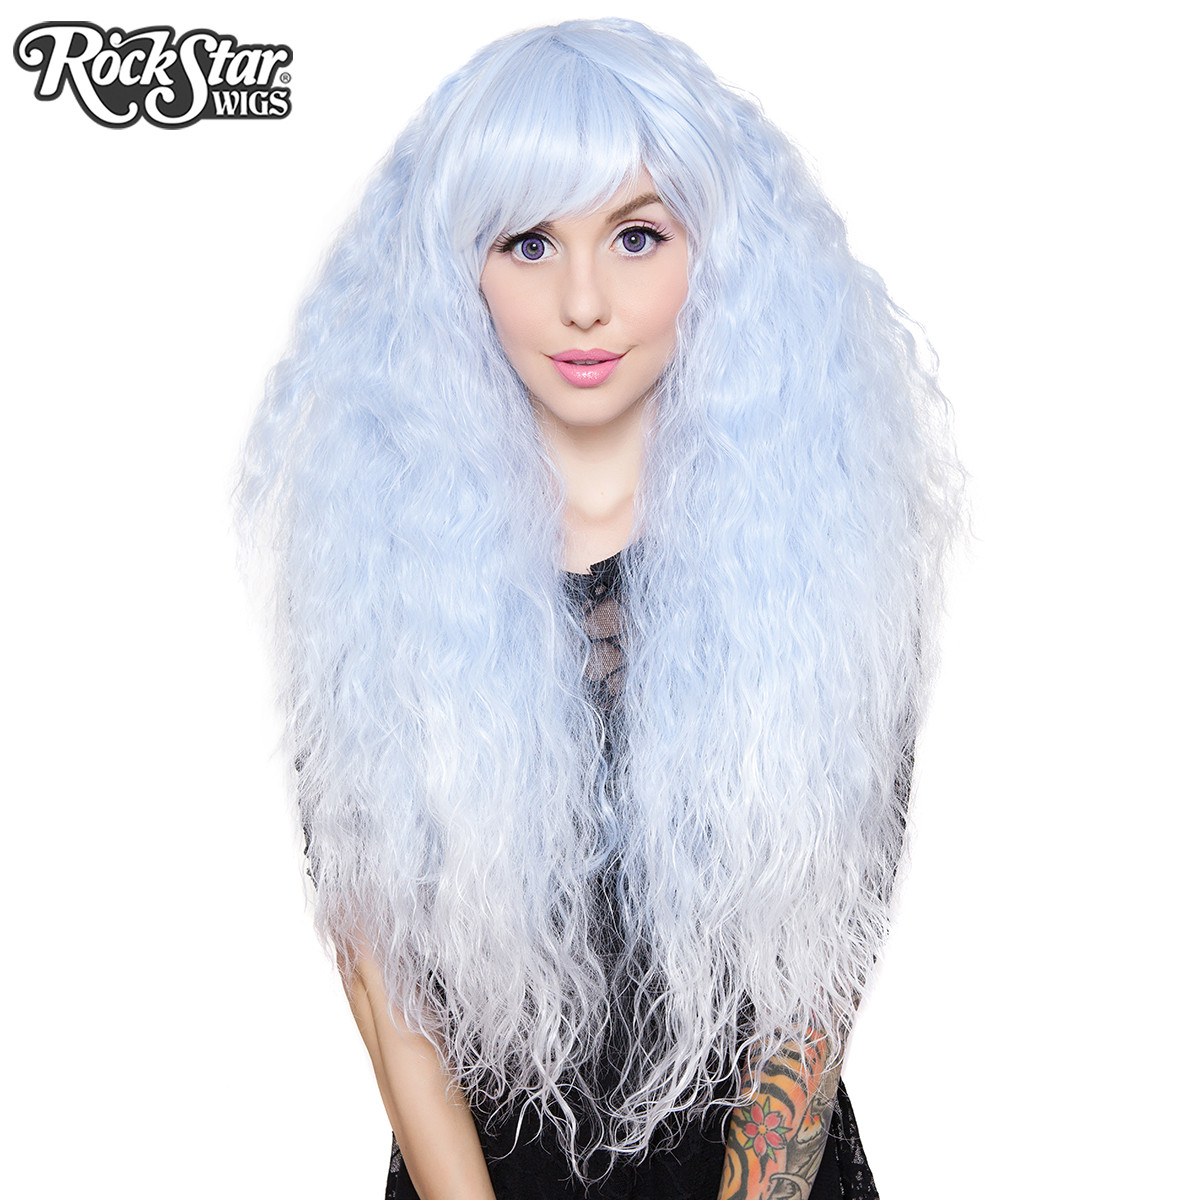 Wig, Rhapsody